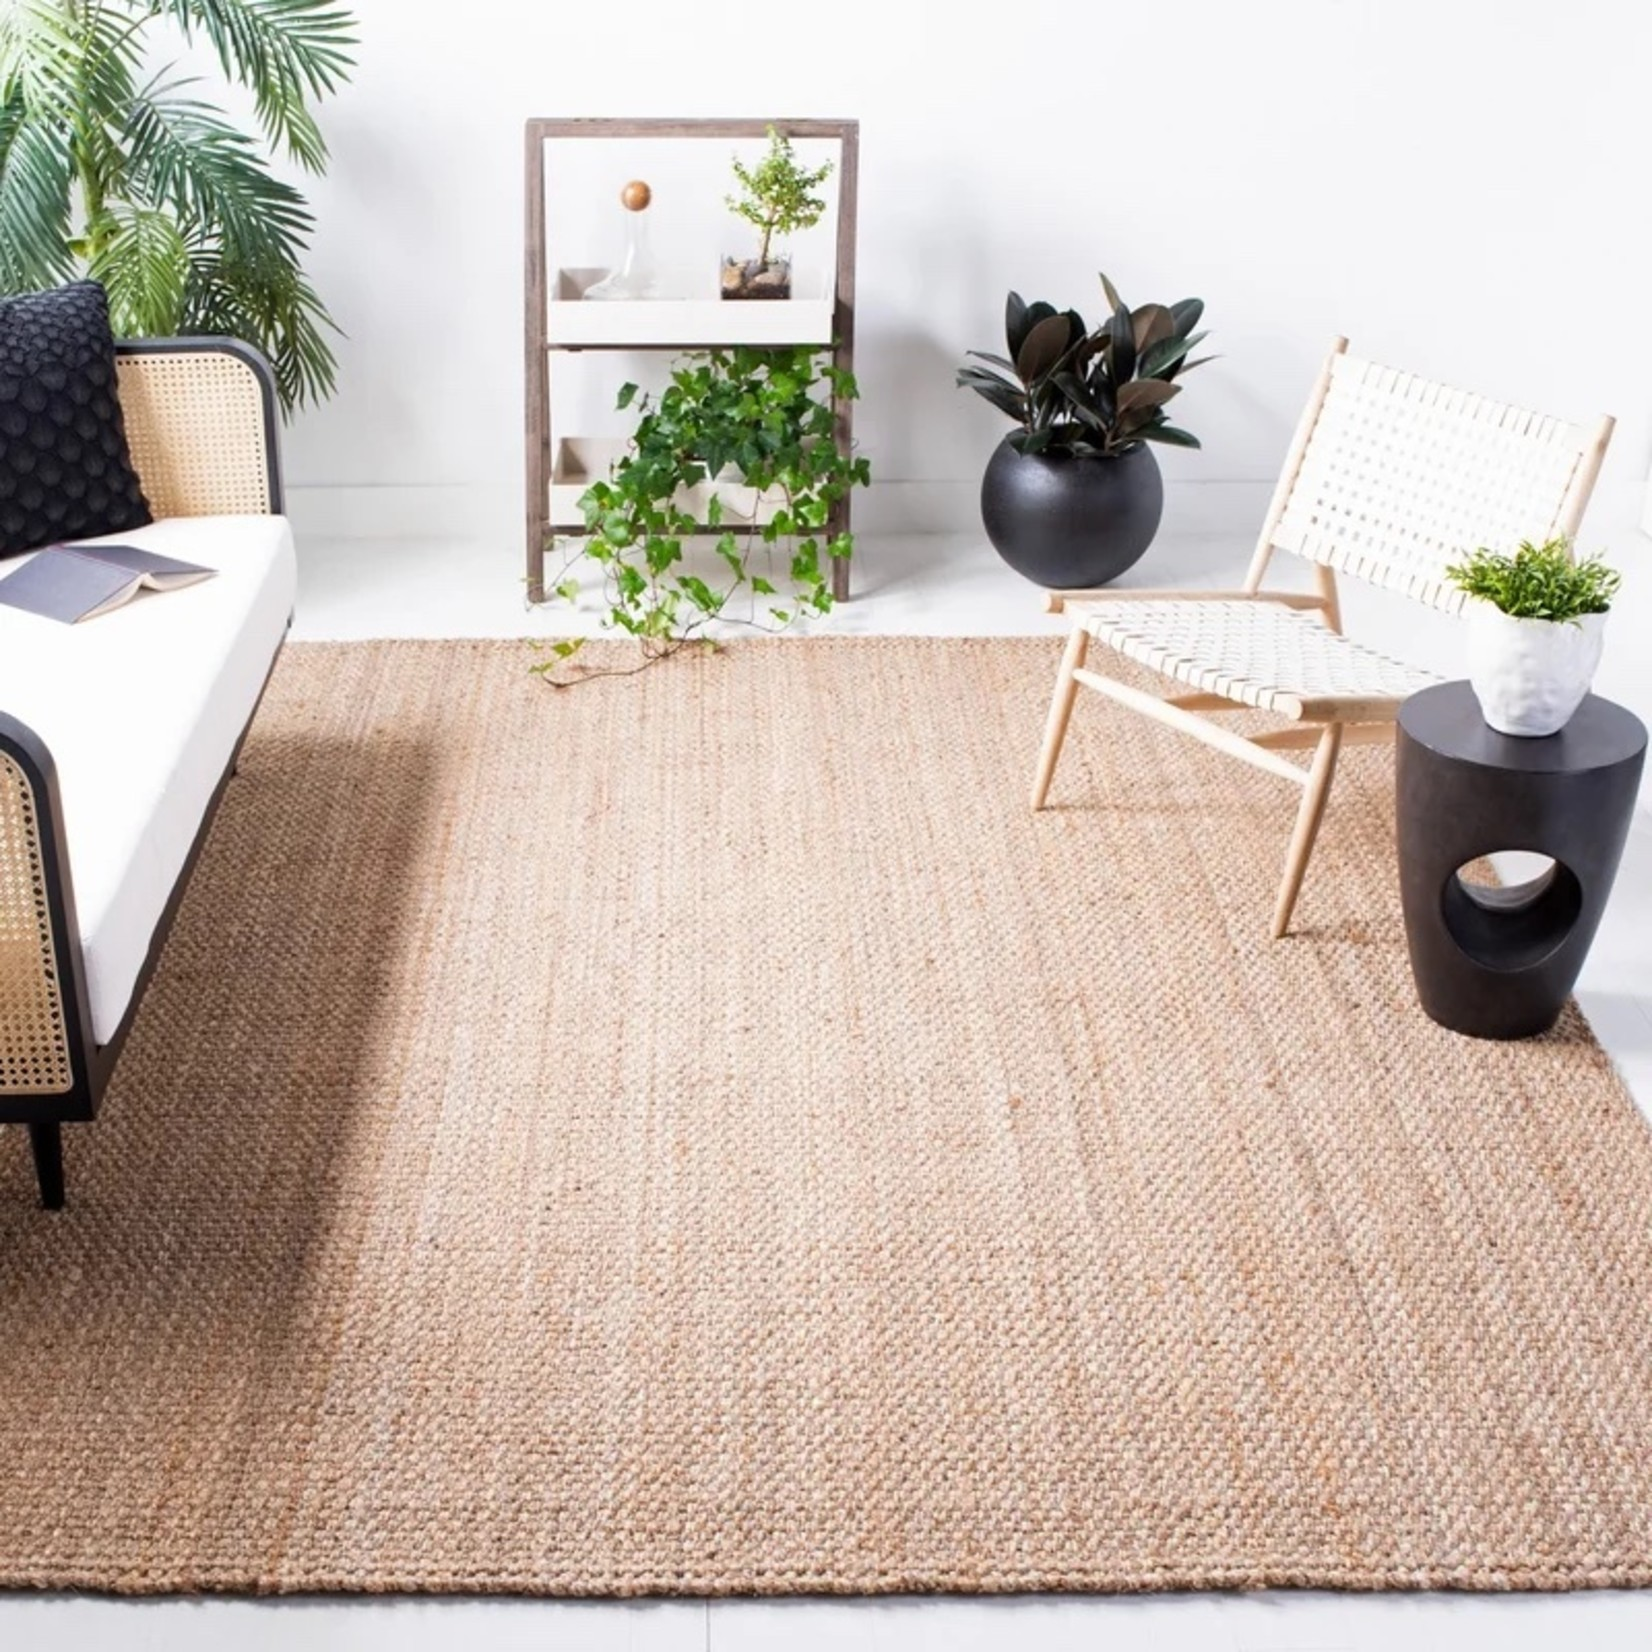 *6' x 9' - Addilyn Handmade Flatweave Jute/Sisal Natural Area Rug